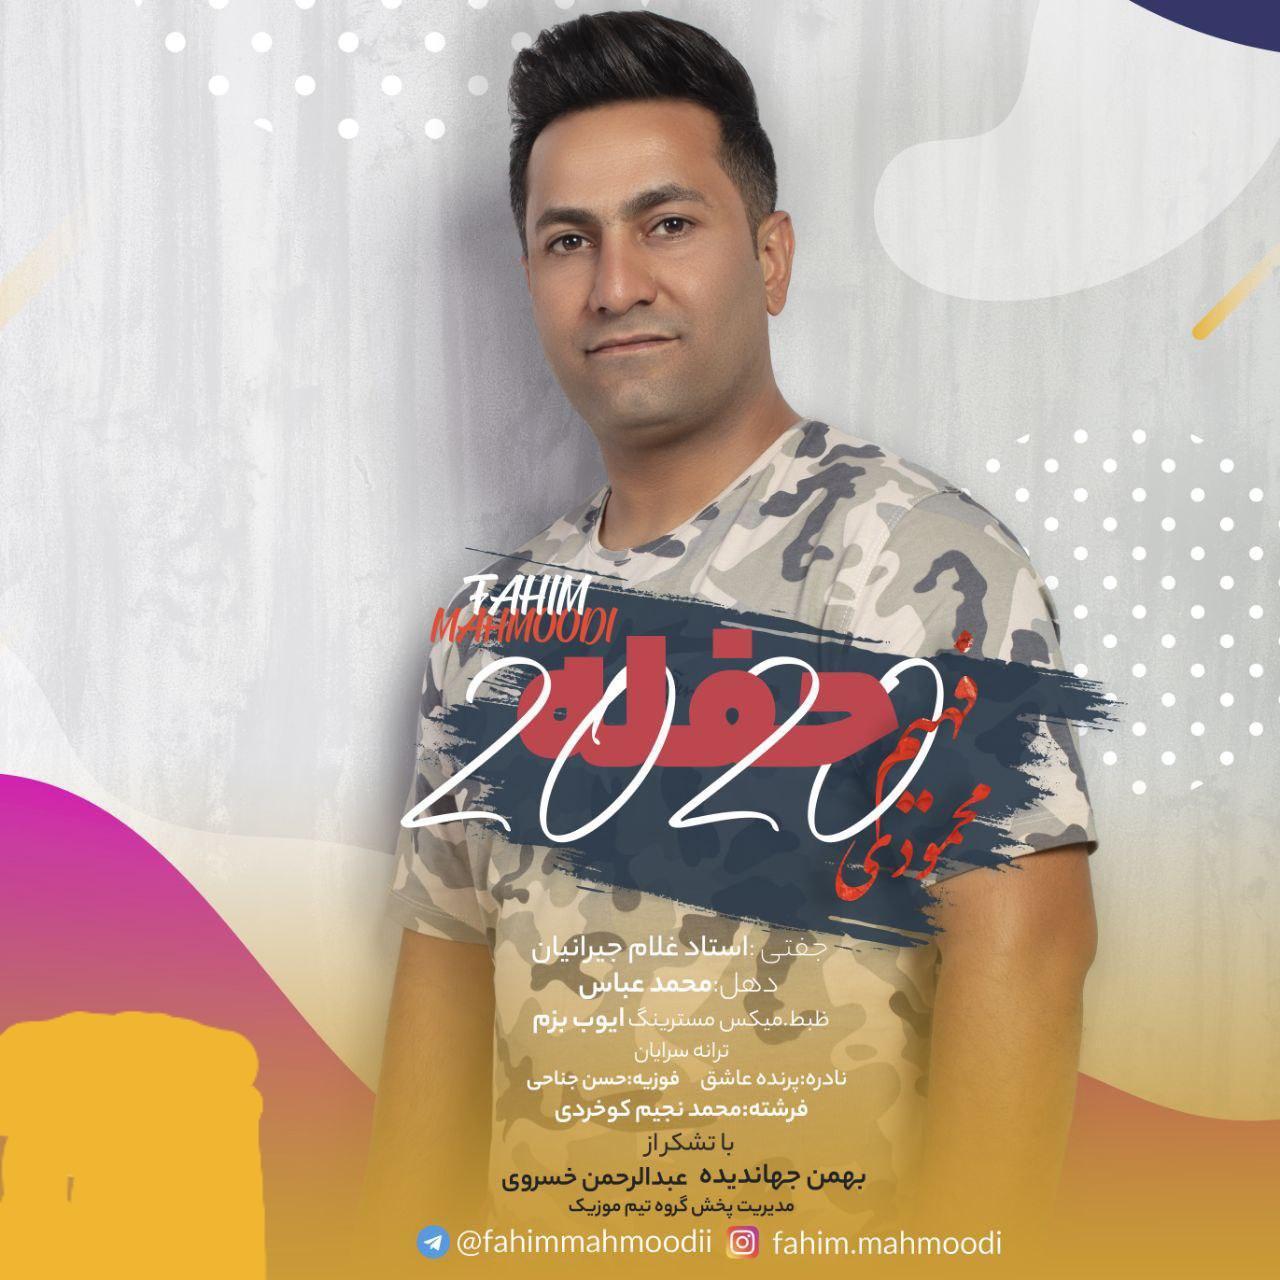 فهیم محمودی حفله ۲۰۲۰